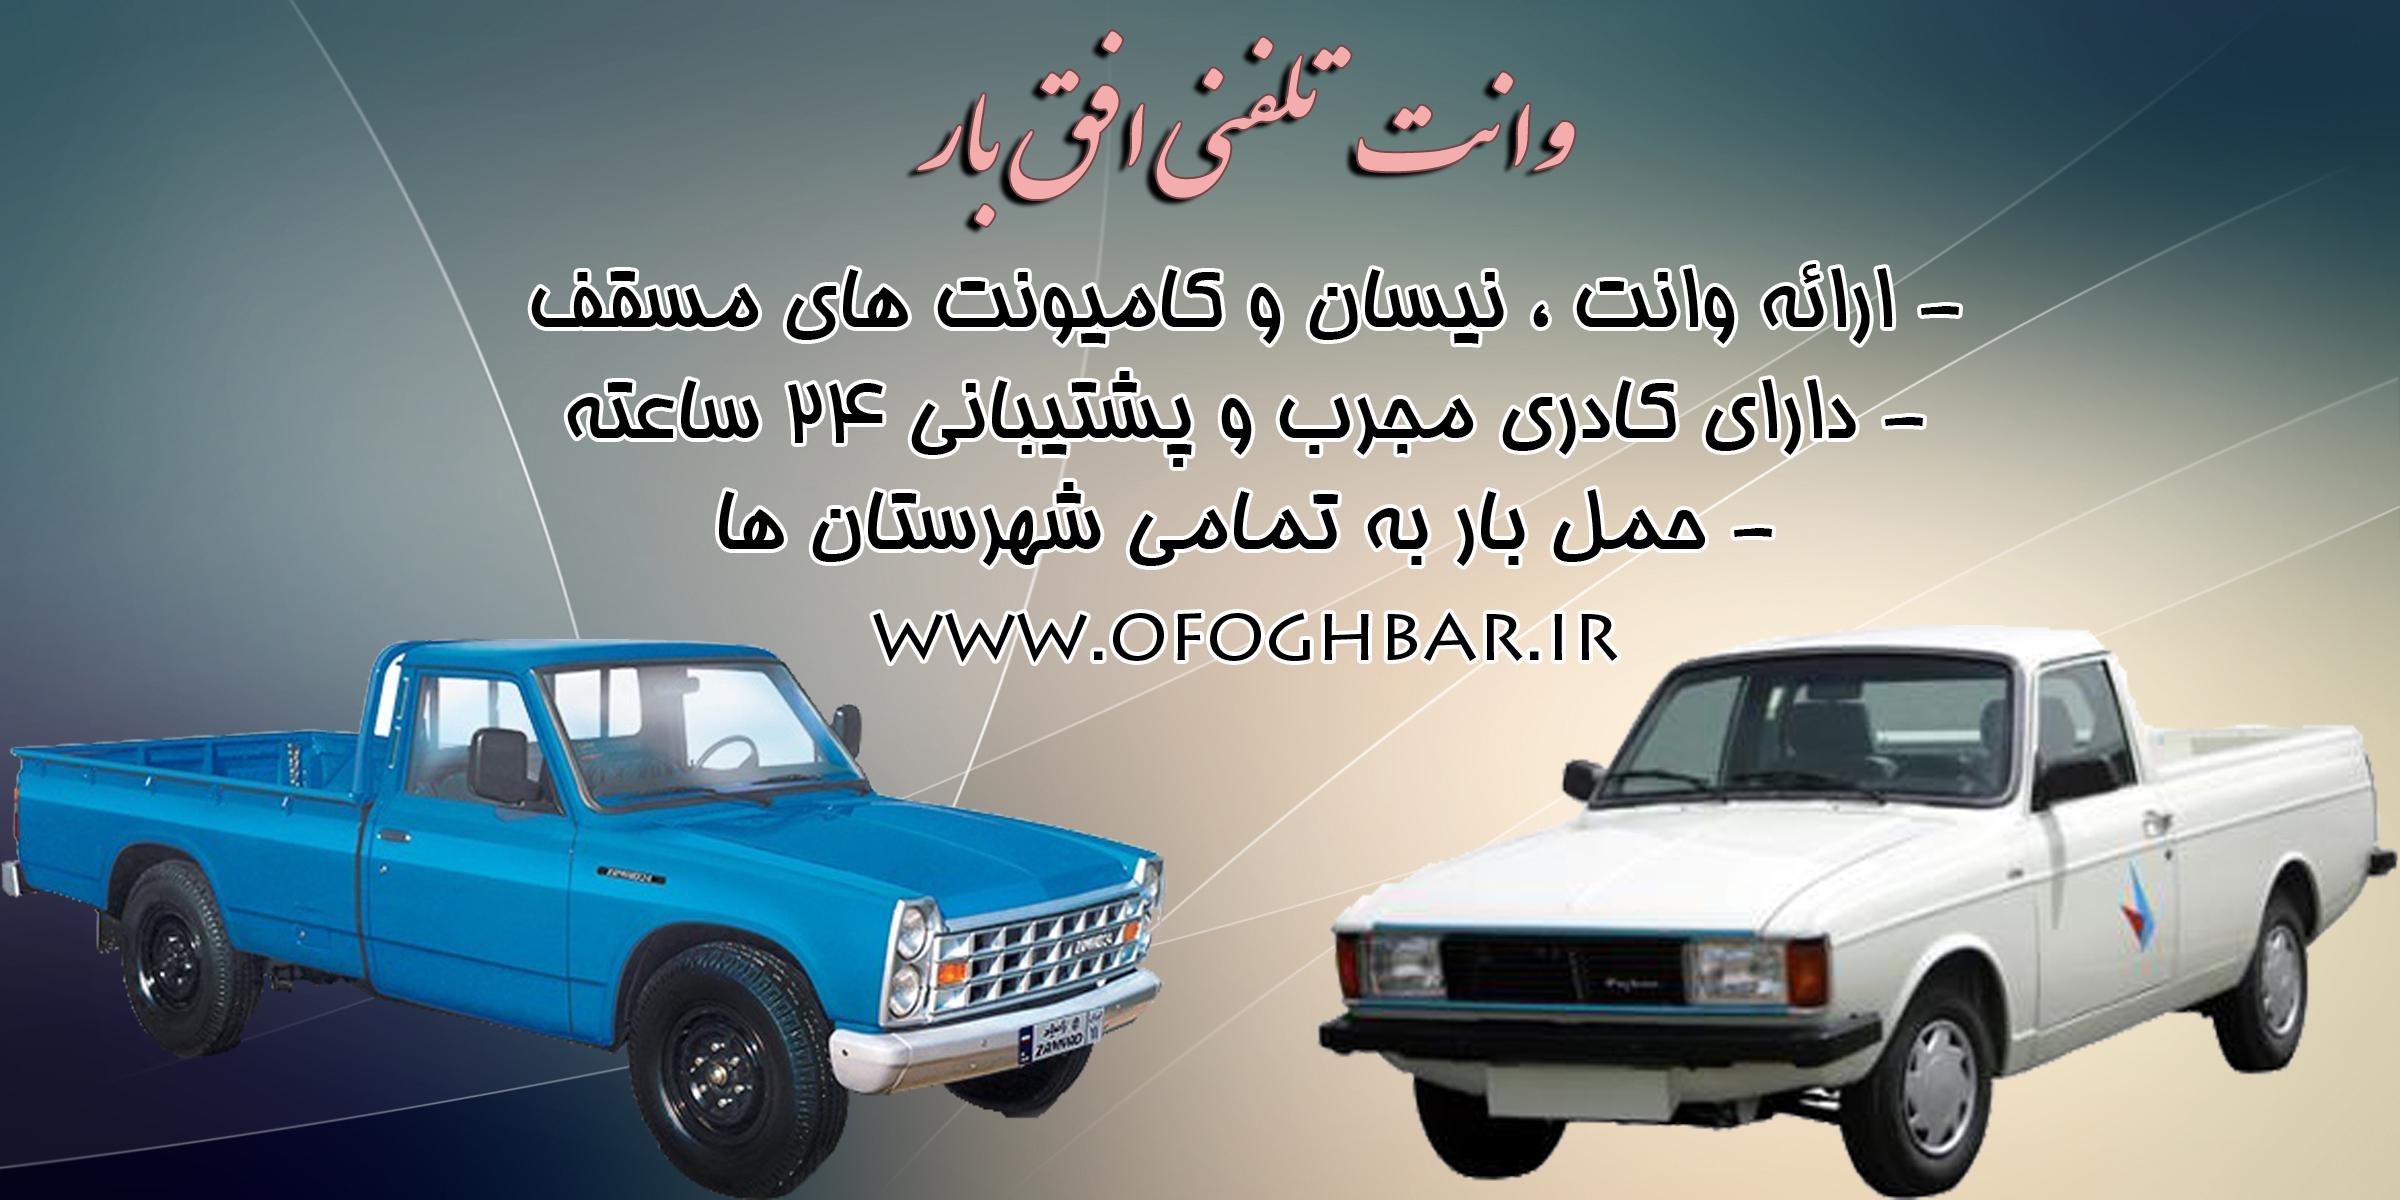 وانت تلفنی تهران